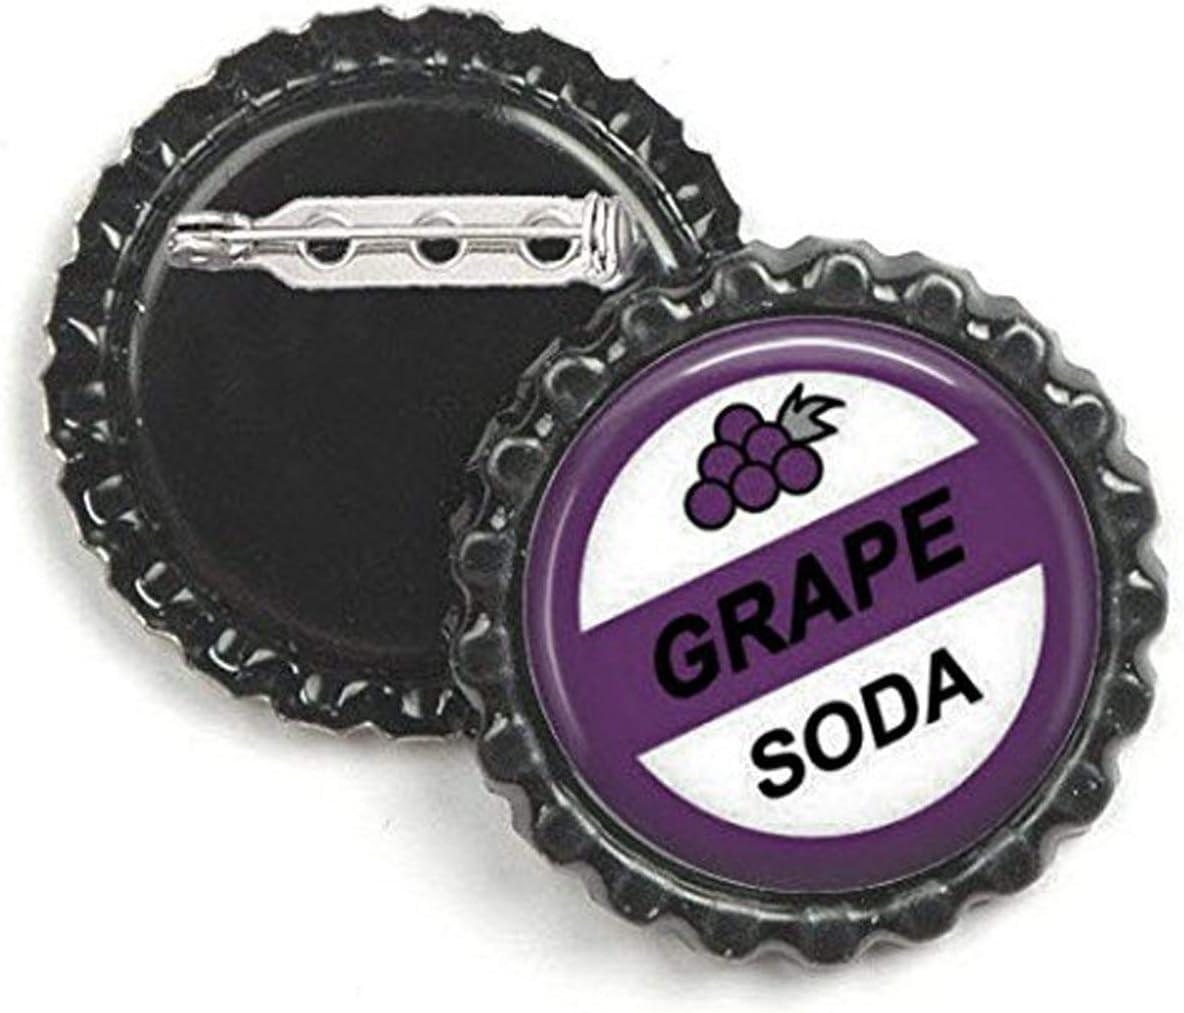 1 x Grape Soda BUTTON PIN BADGES 25mm 1 INCH Novelty Bottle Cap Up!